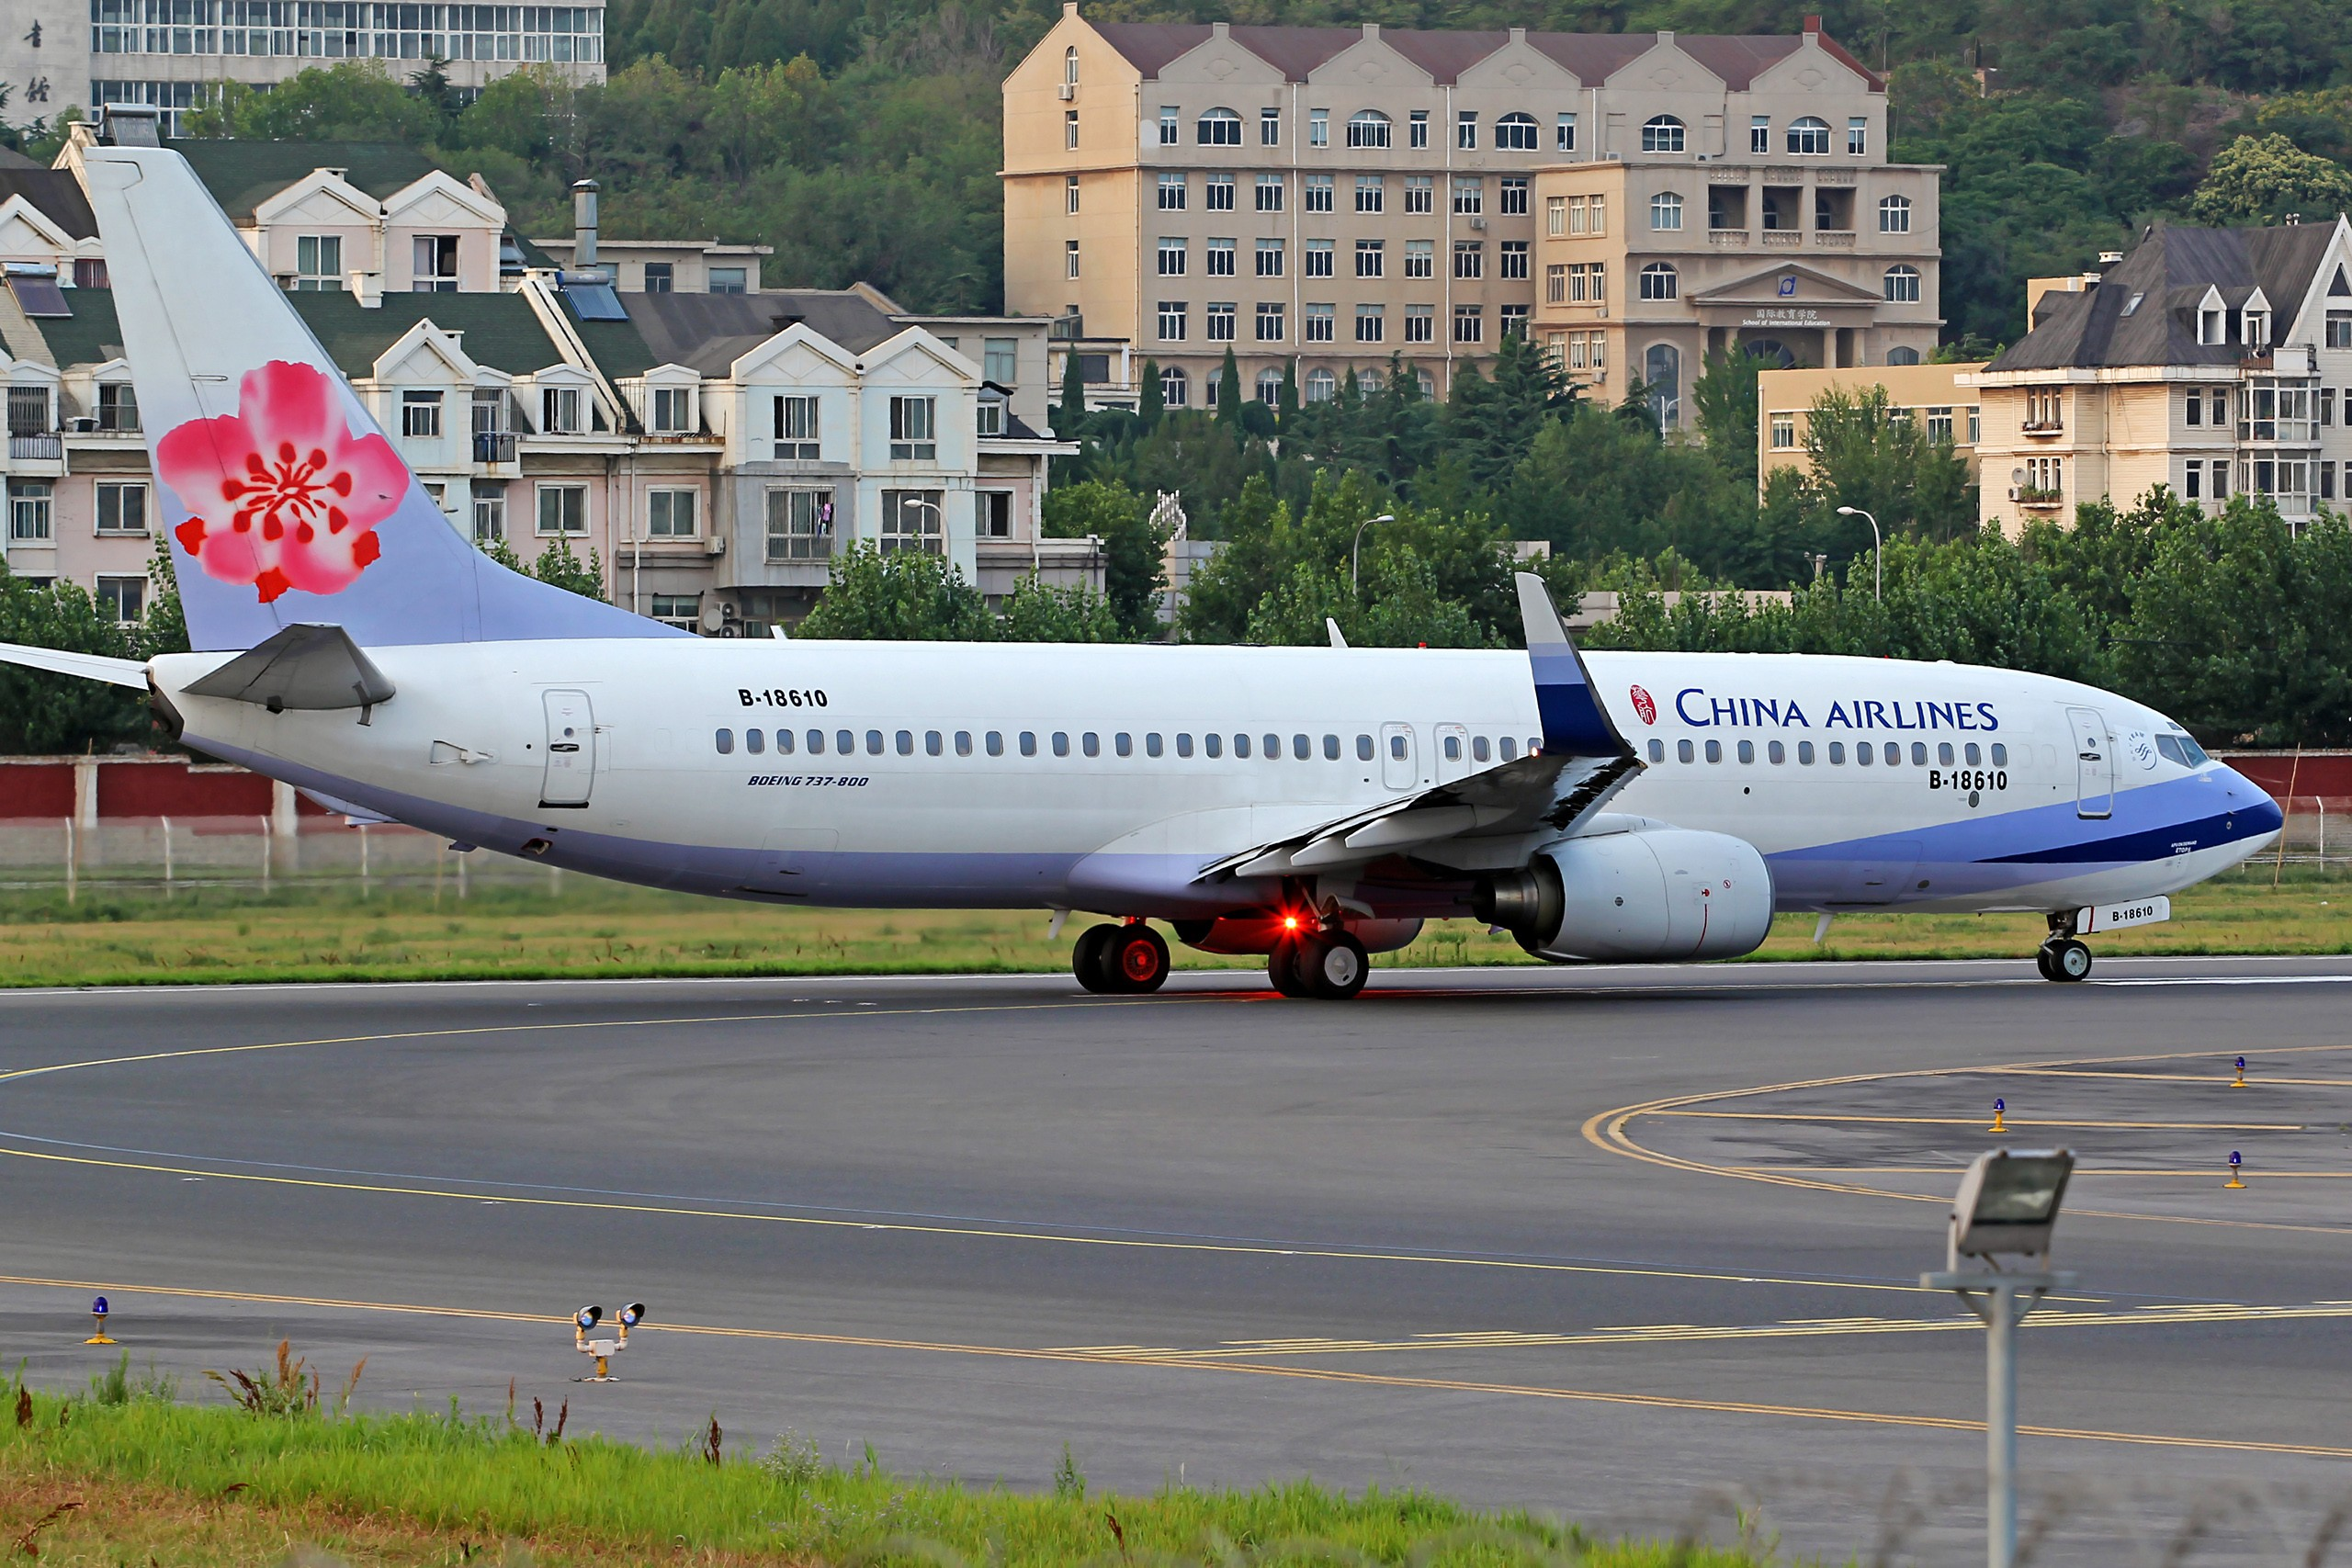 Re:[原创][DLC]...窄体机...2560x1707}Pix BOEING 737-800 B-18610 中国大连周水子国际机场